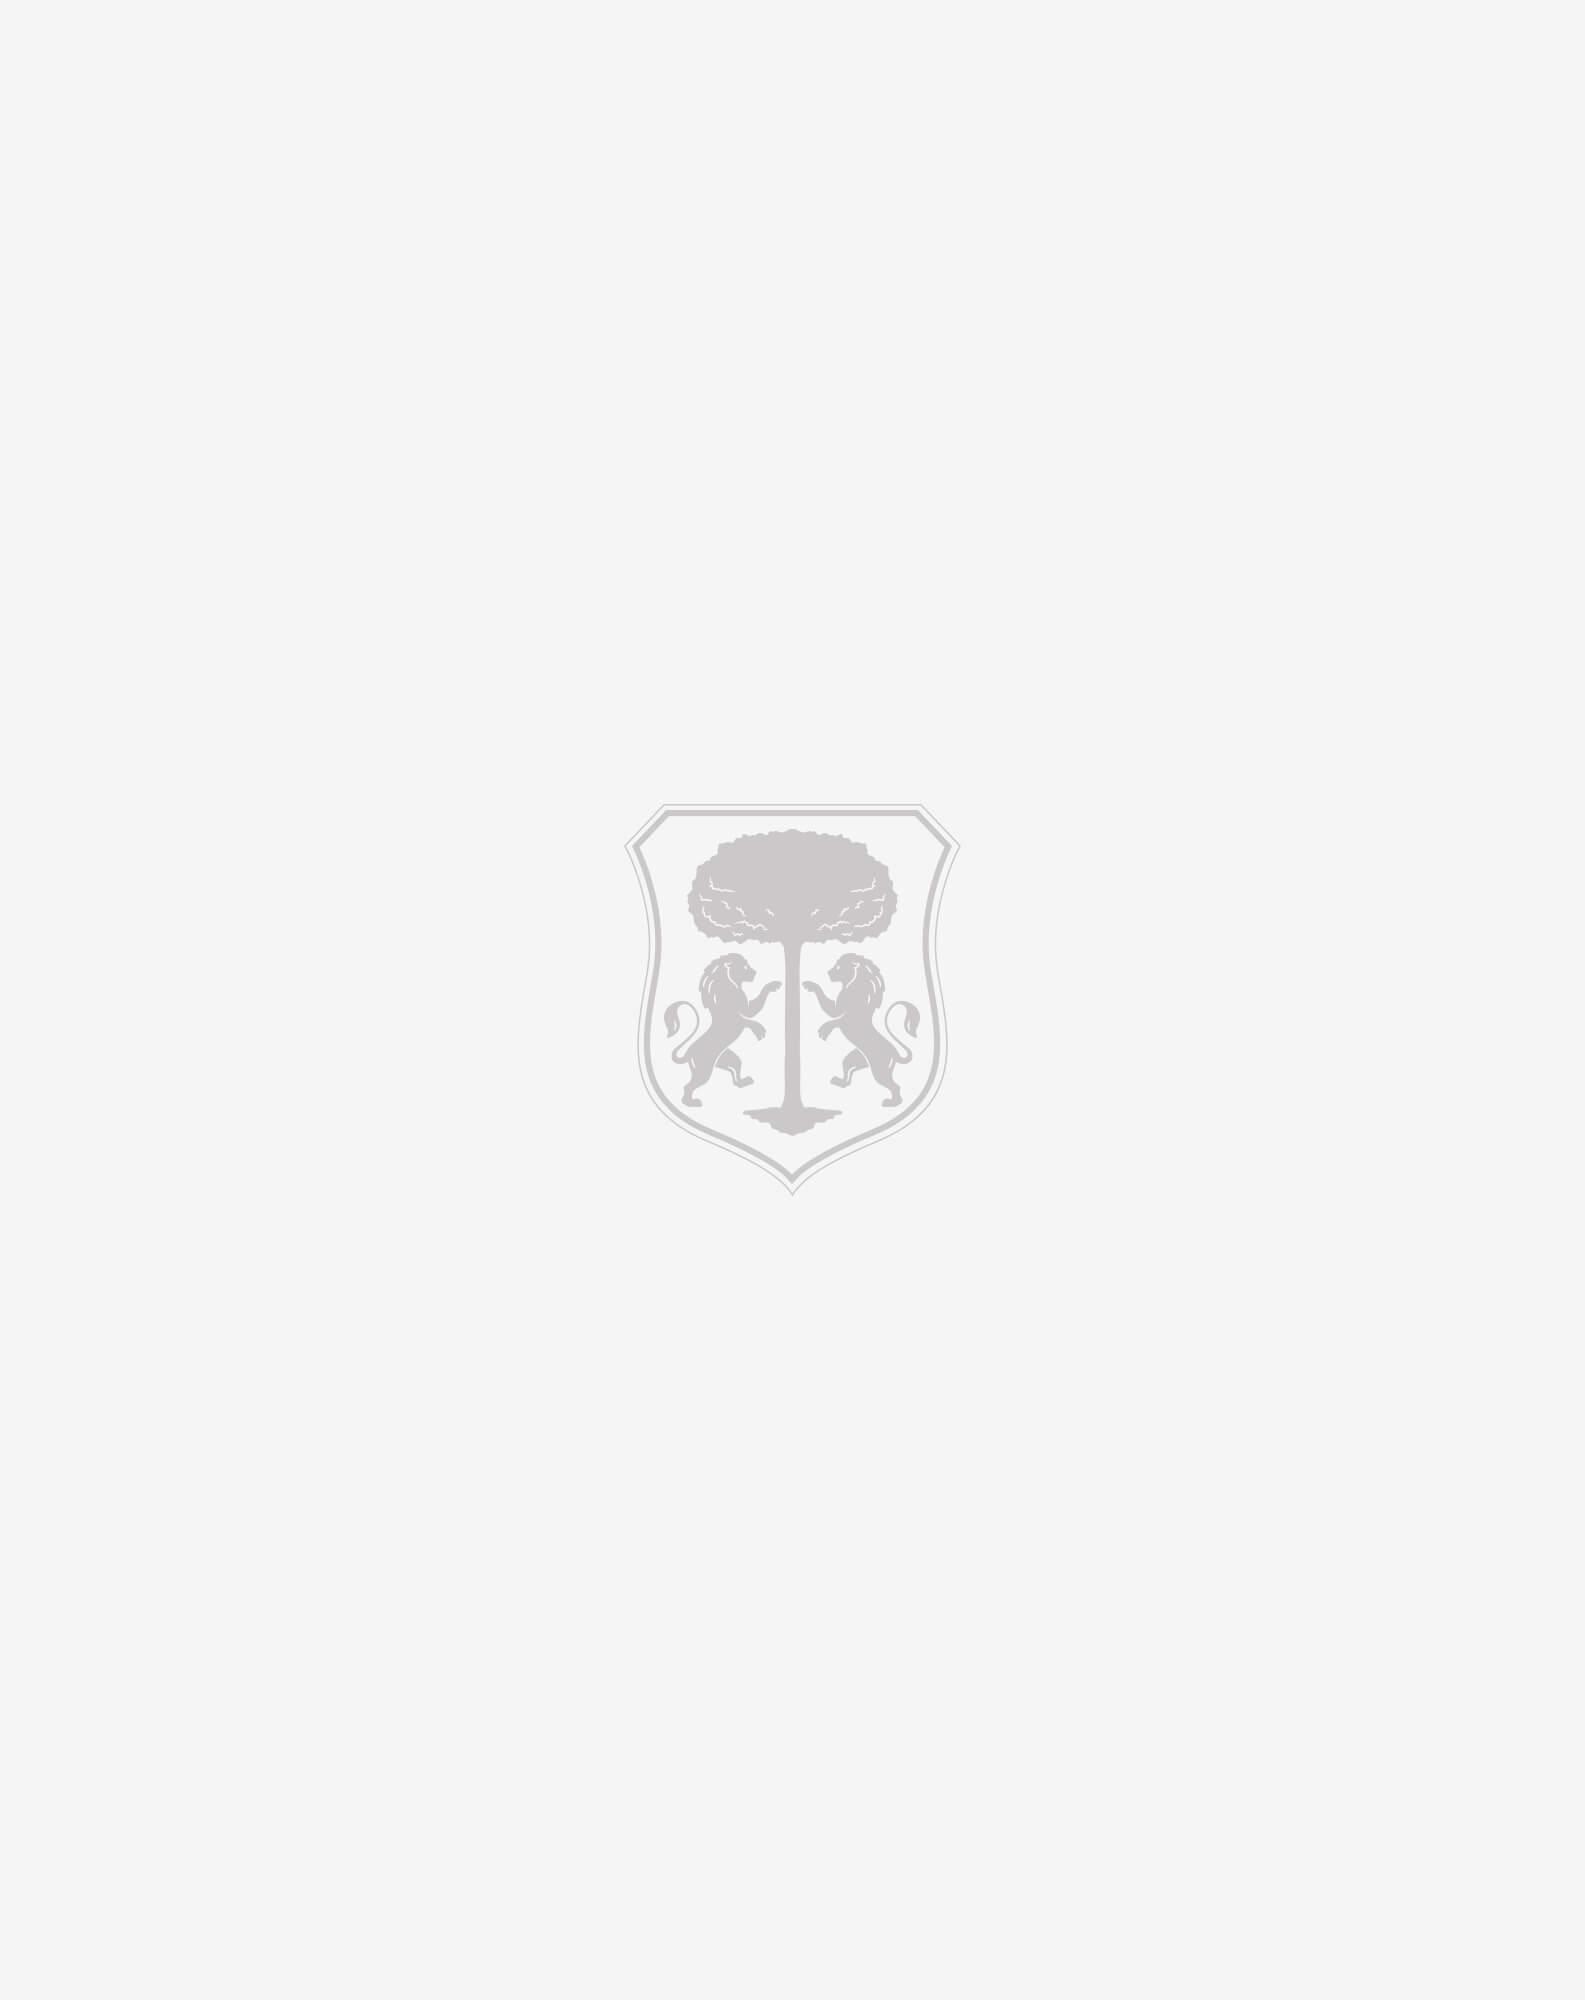 Style&Freedom full-zip fleece sweater